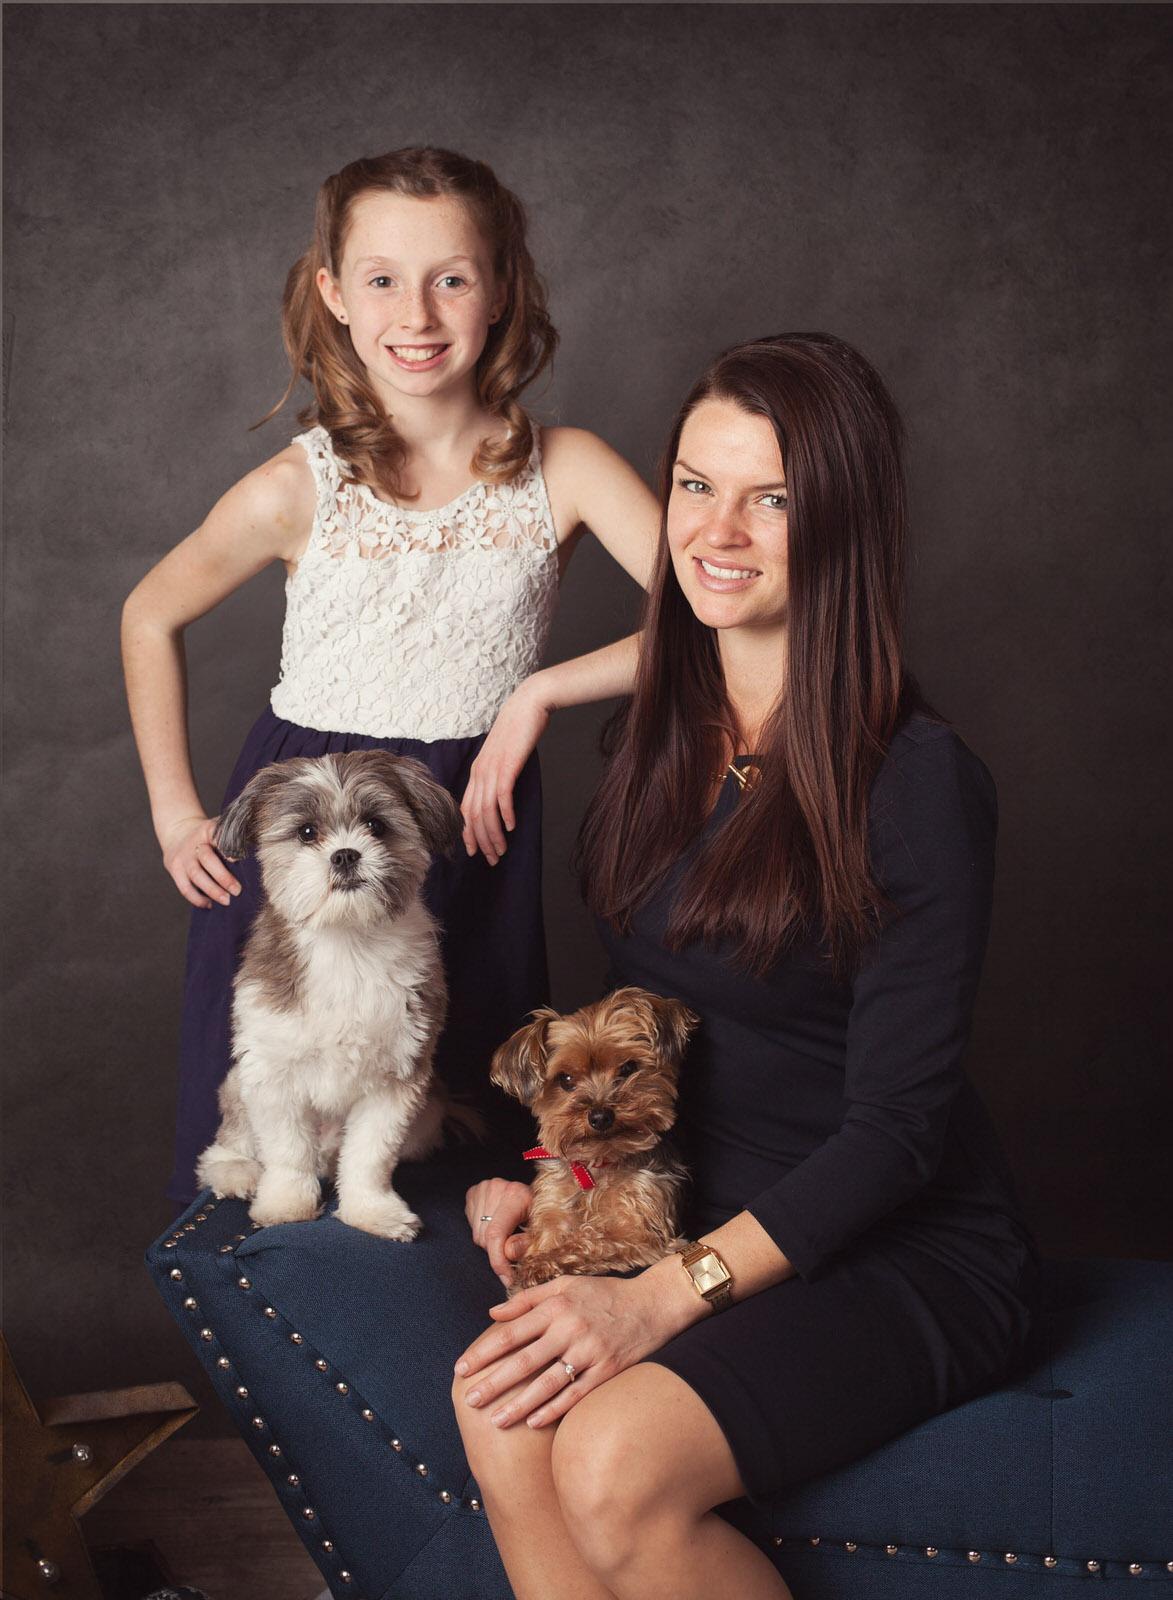 upper-peninsula-photographer-family-children-marquette-michigan-jackie-solomon-010.jpg